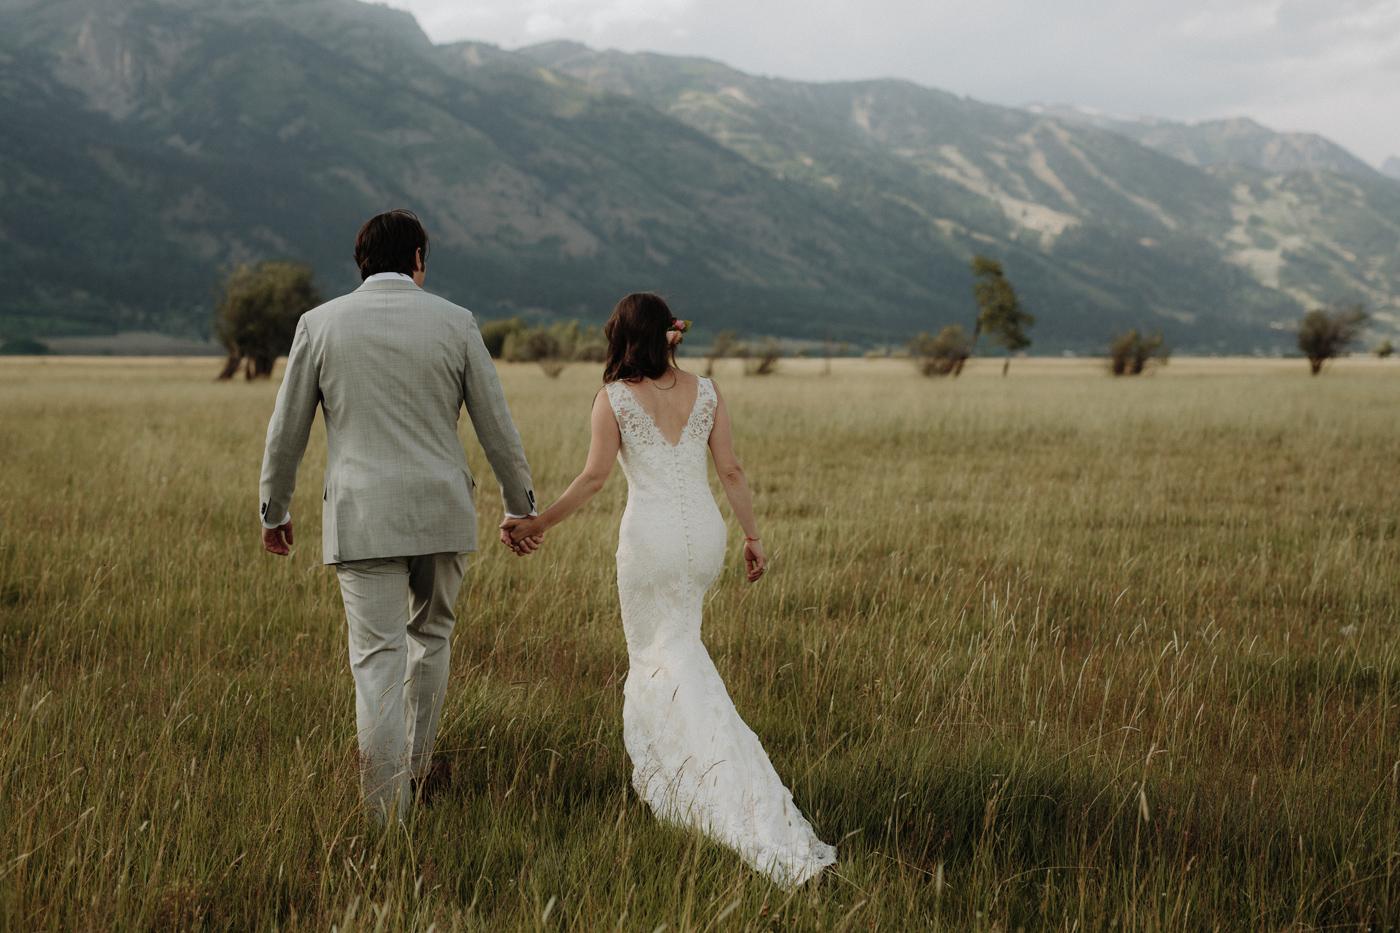 056-grand-teton-jackson-hole-wyoming-wedding.jpg